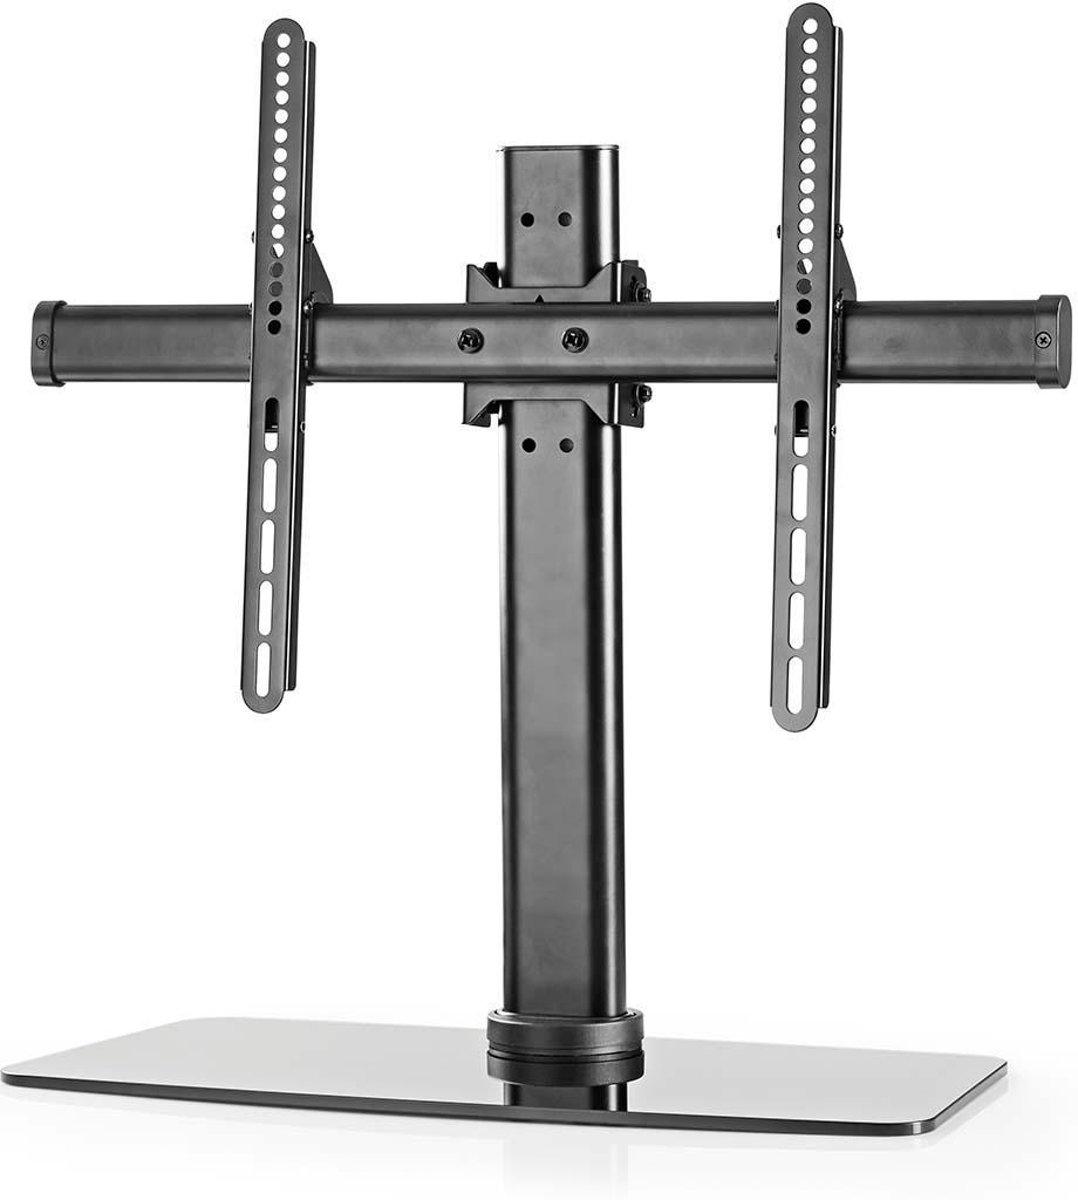 """Full-Motion TV-standaard | 32 - 65"""" | Max. 45 kg | 3 hoogtestanden"" kopen"